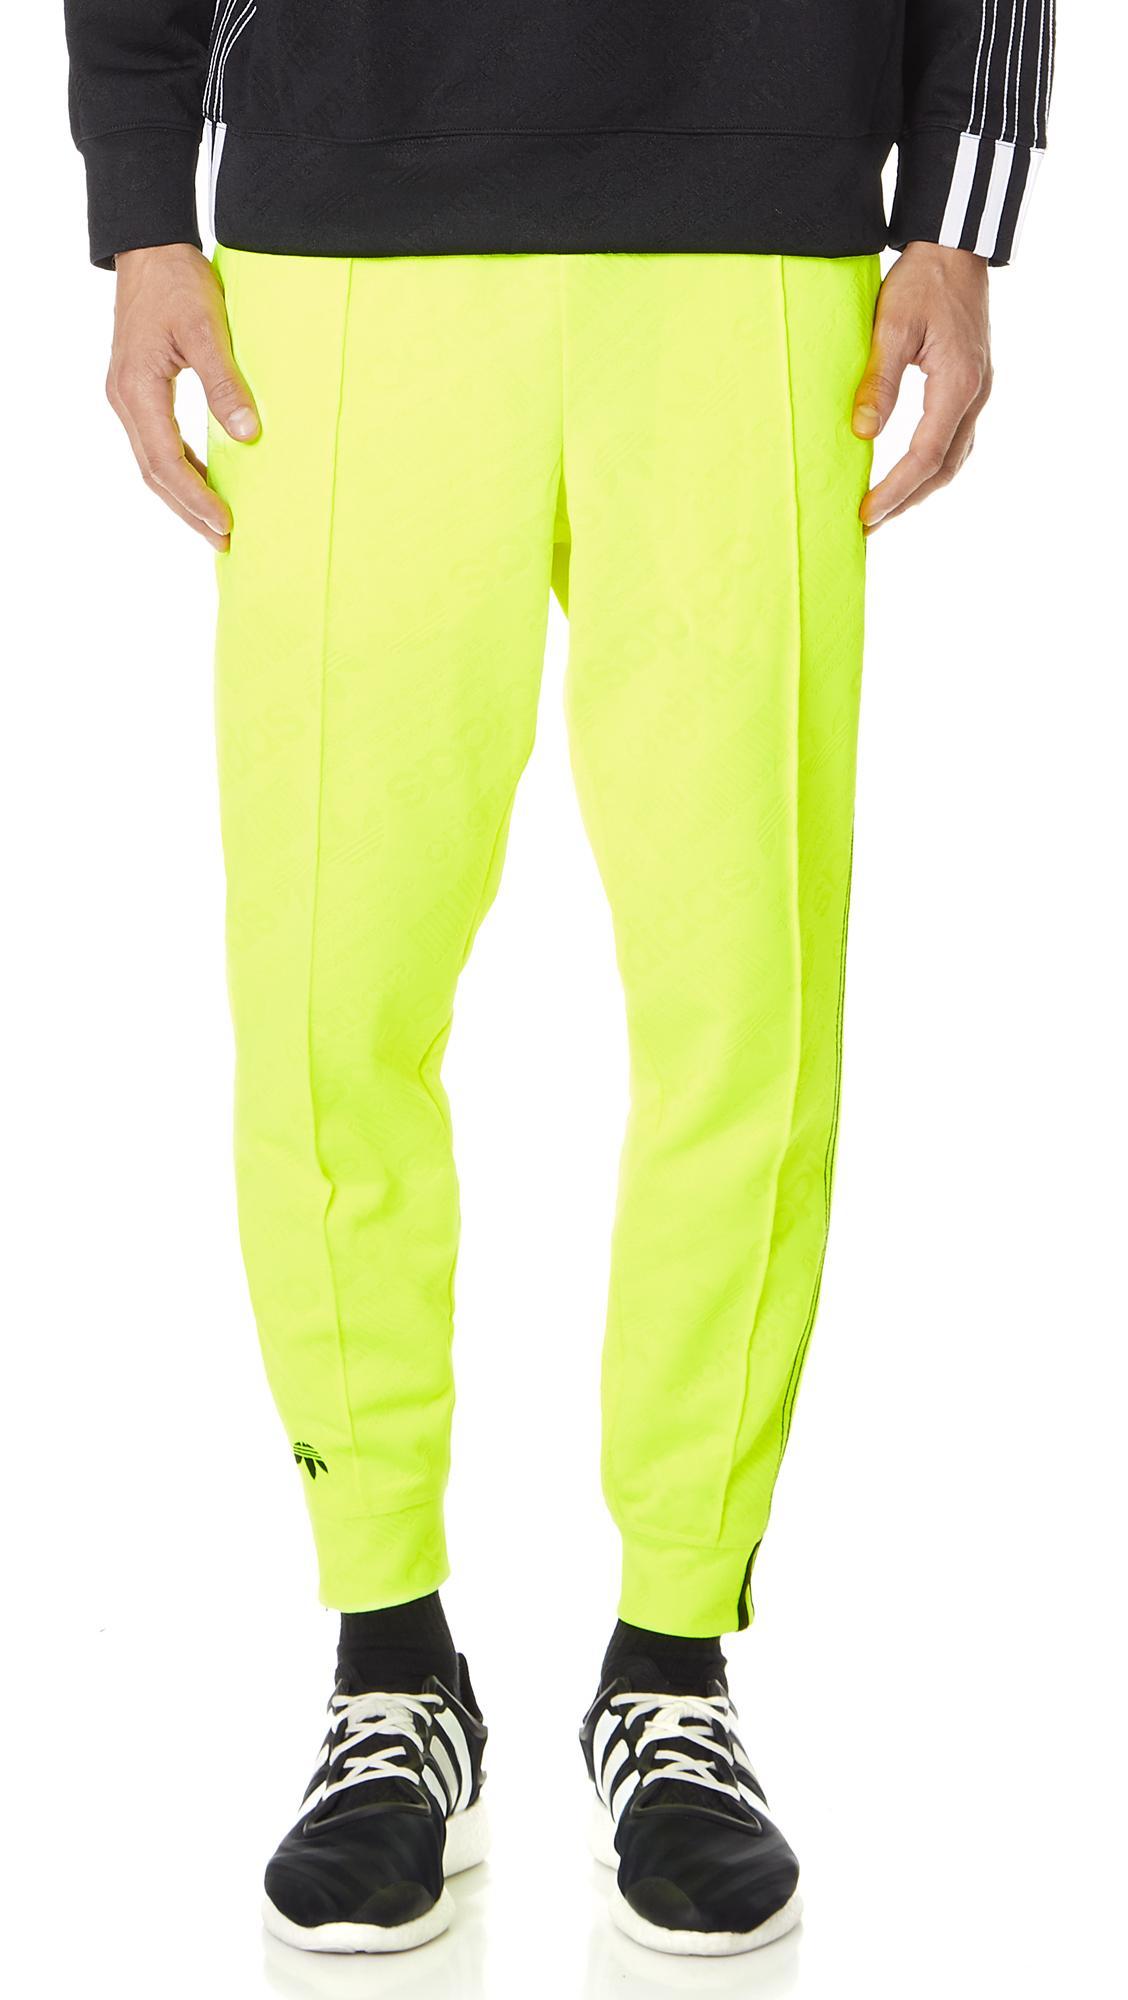 Adidas Originals By Alexander Wang Aw Jacquard Track Pants In Solar Yellow